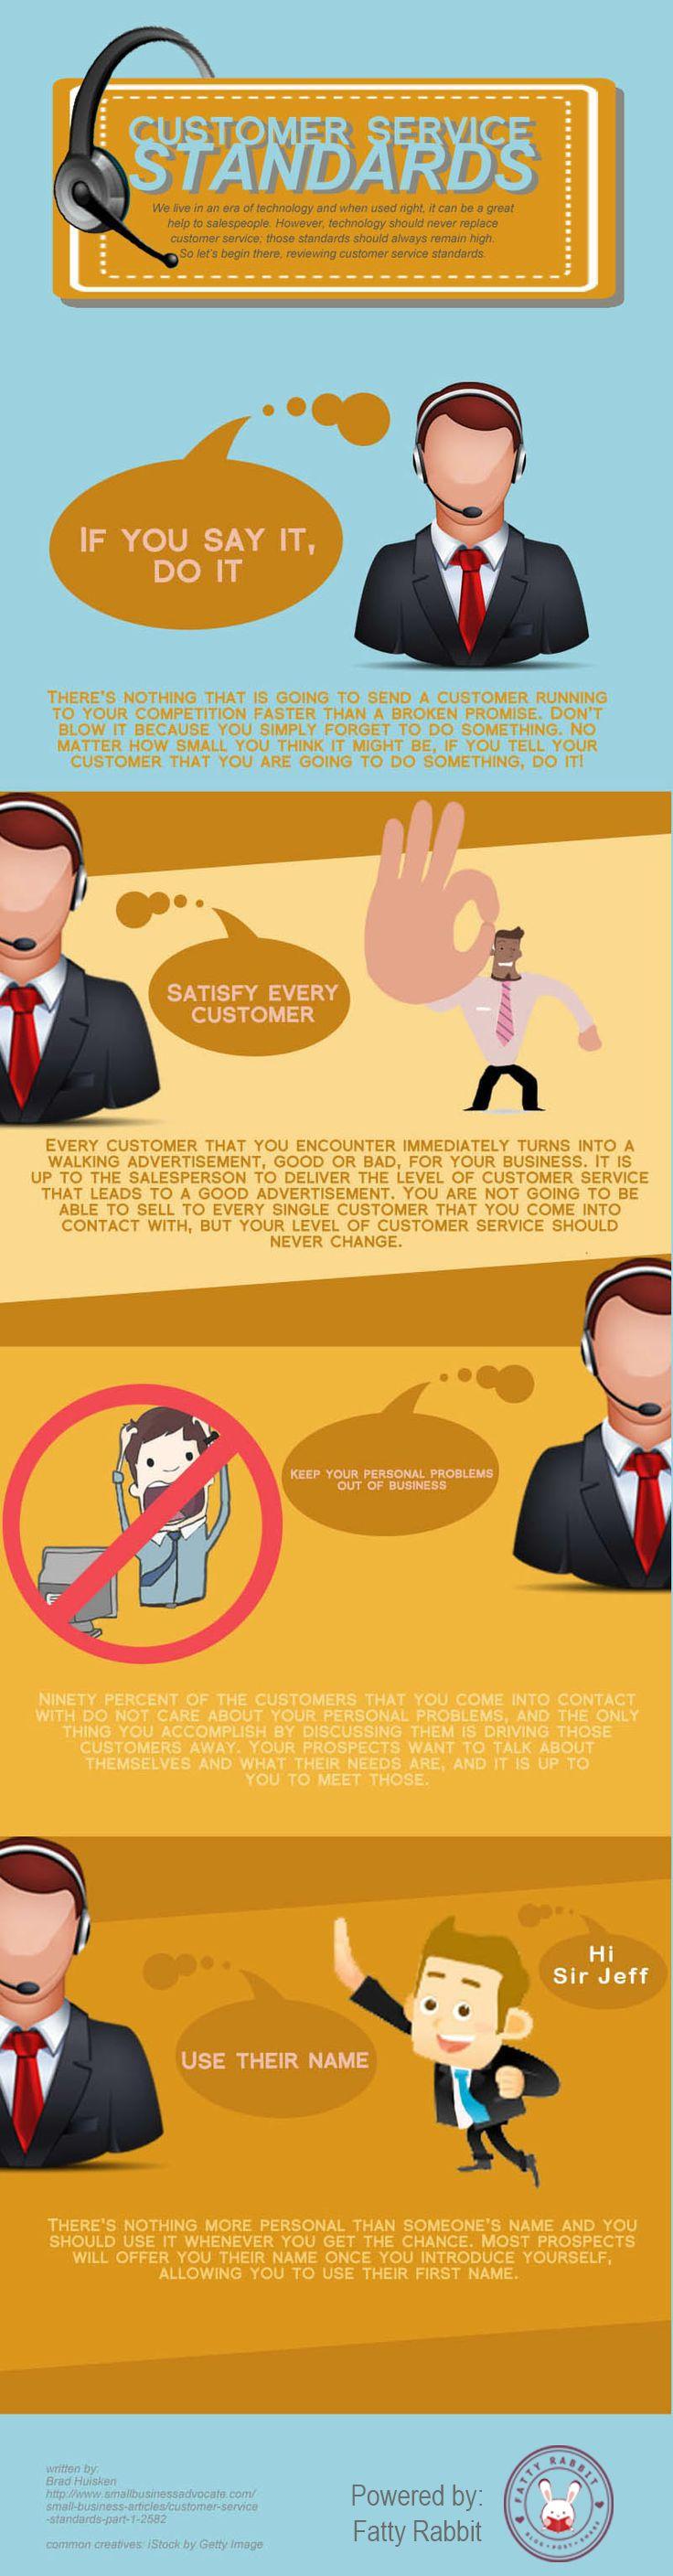 Customer Service Standards  #medium #business #strategy